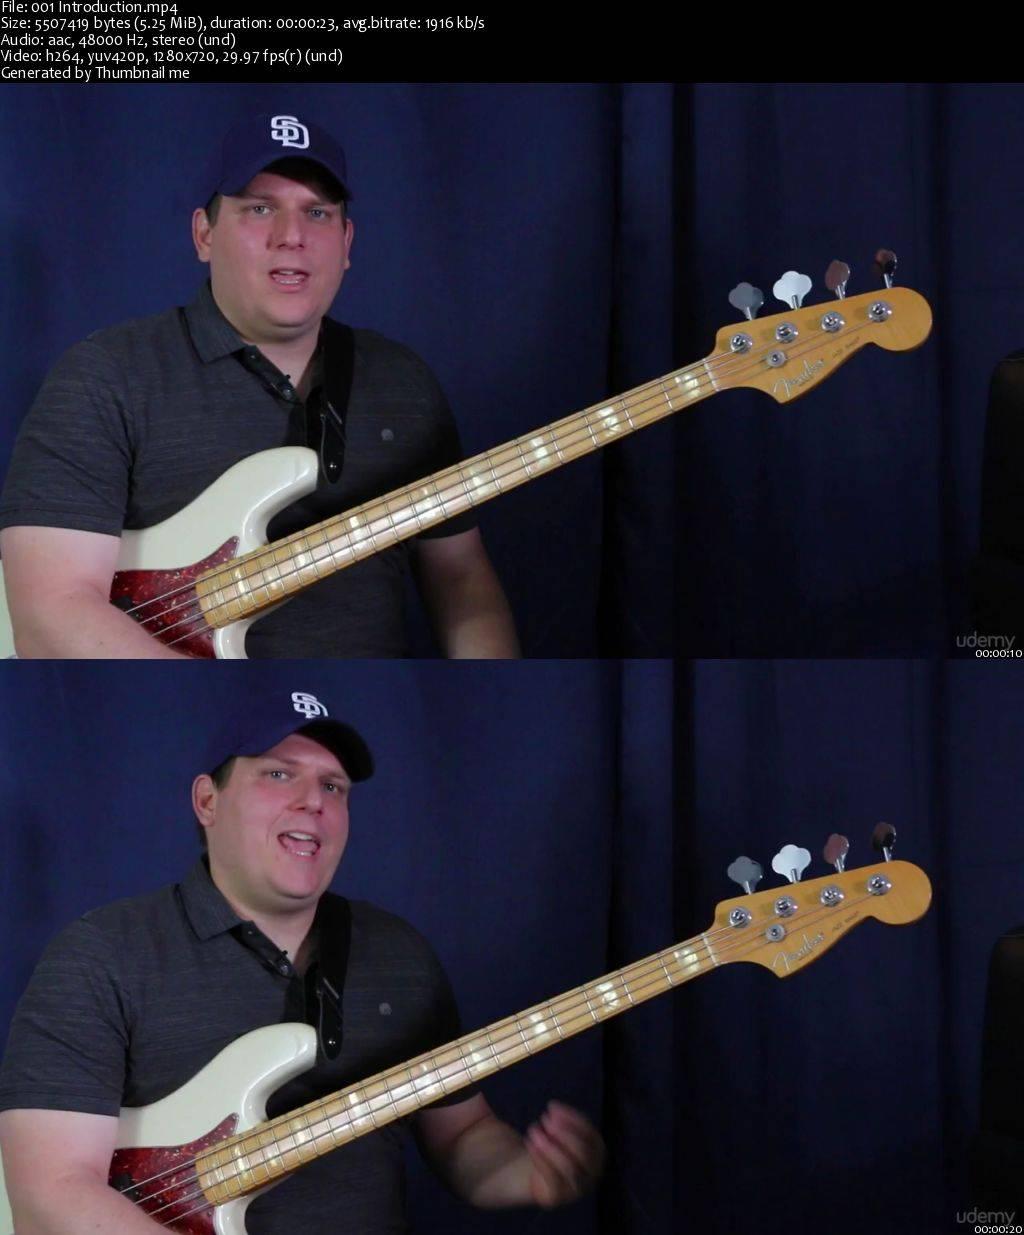 Pentatonic Scale Crash Course for Bass Guitar